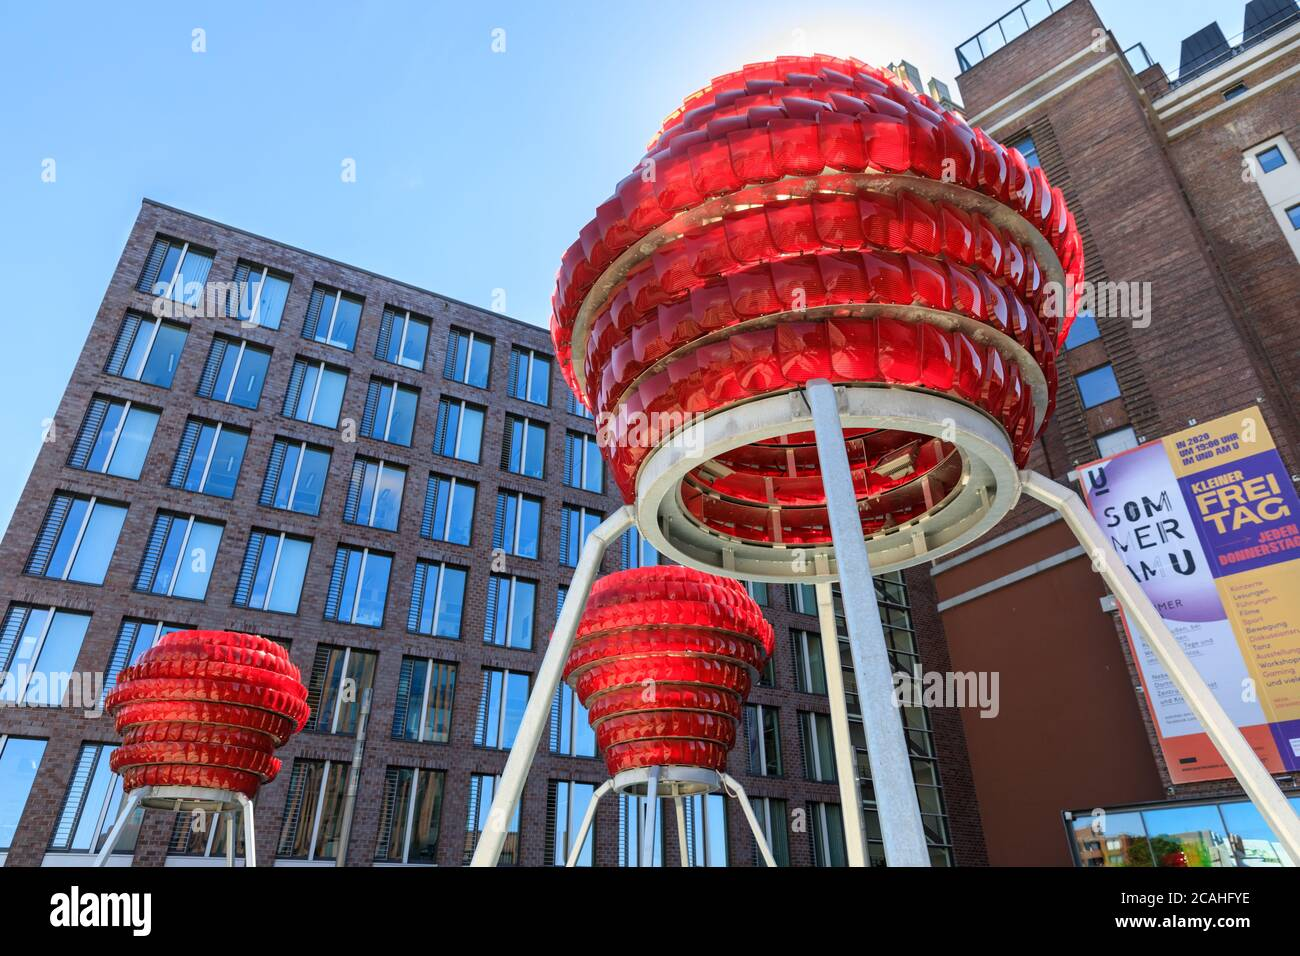 'Dortmunder Rosen' vibrant red public art installation made from recycled car lights by Winter / Hoerbelt, outside Dortmunder U museum, Germany Stock Photo